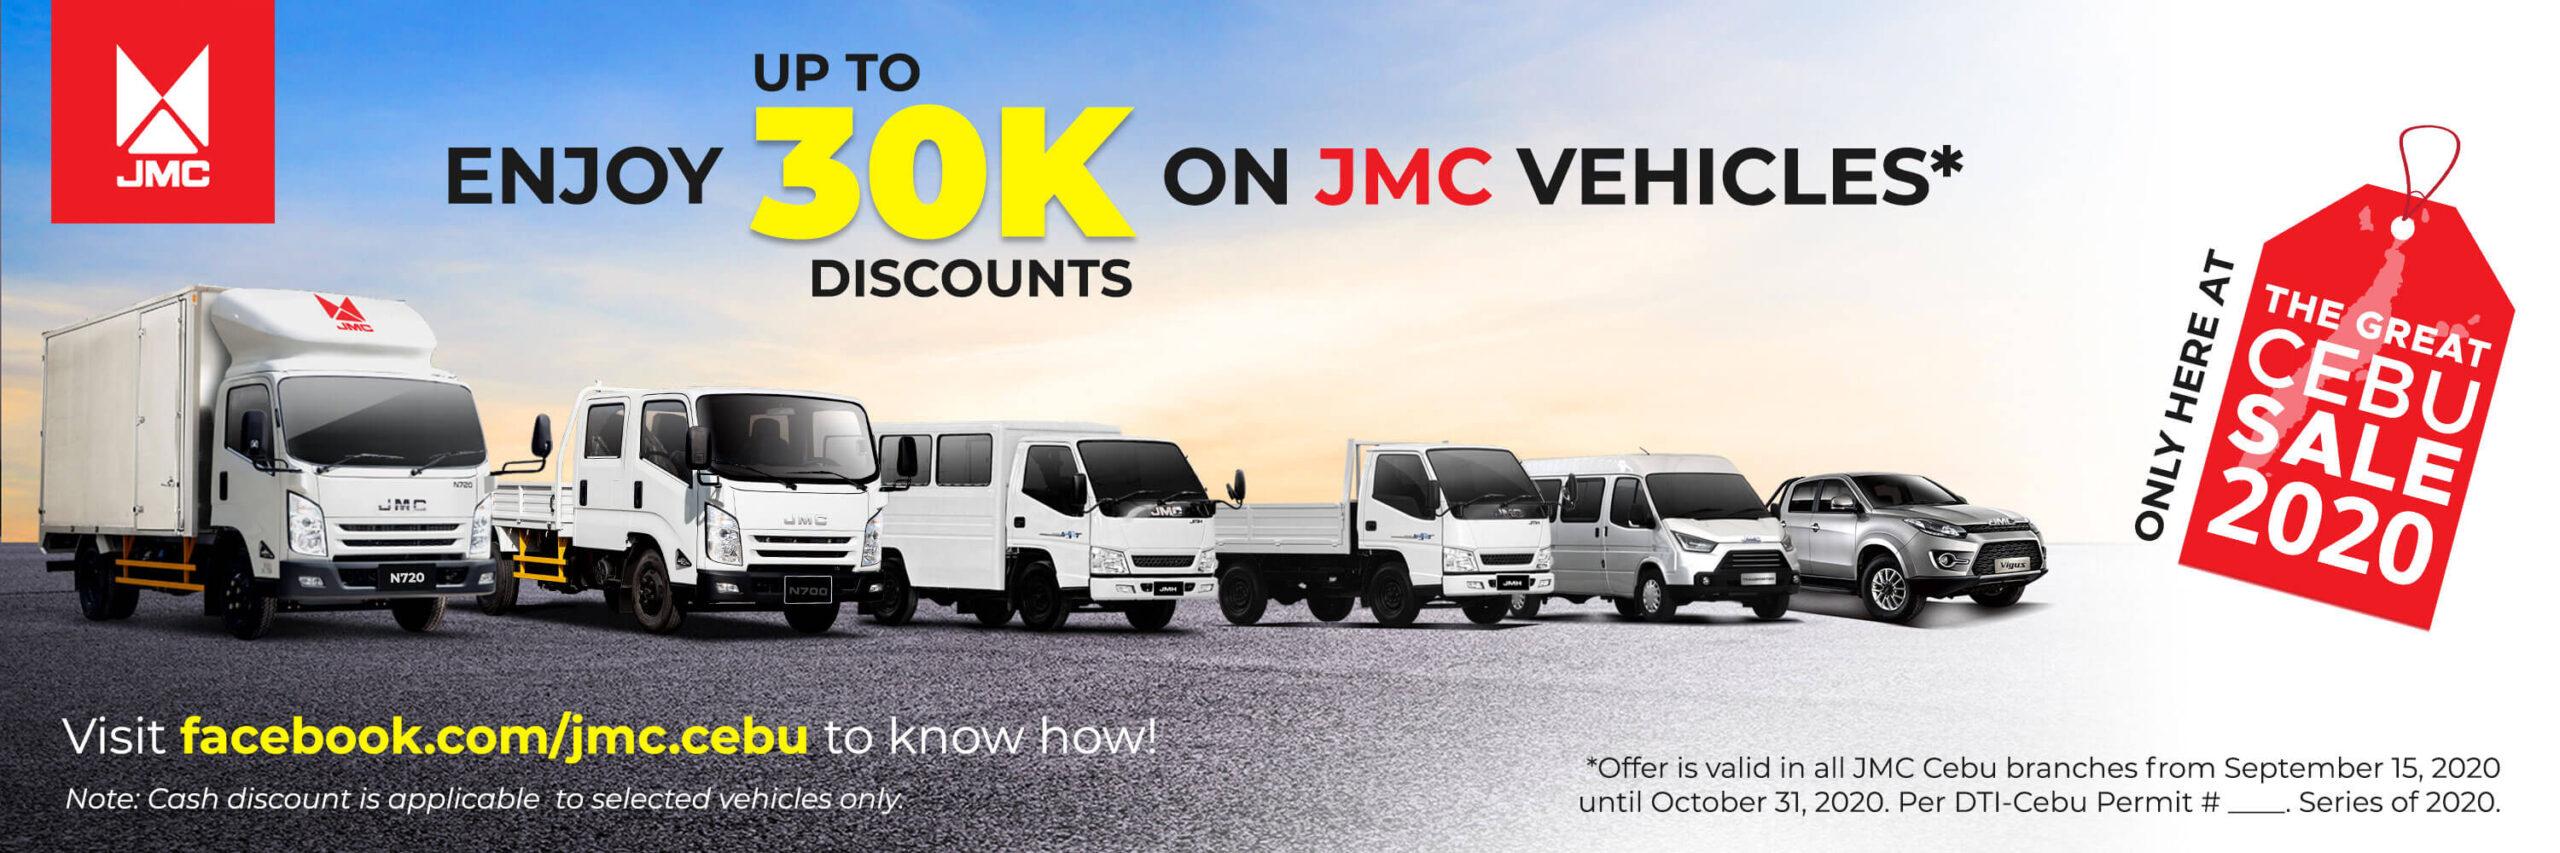 JMC Cebu offers up to P30K discount on vehicles